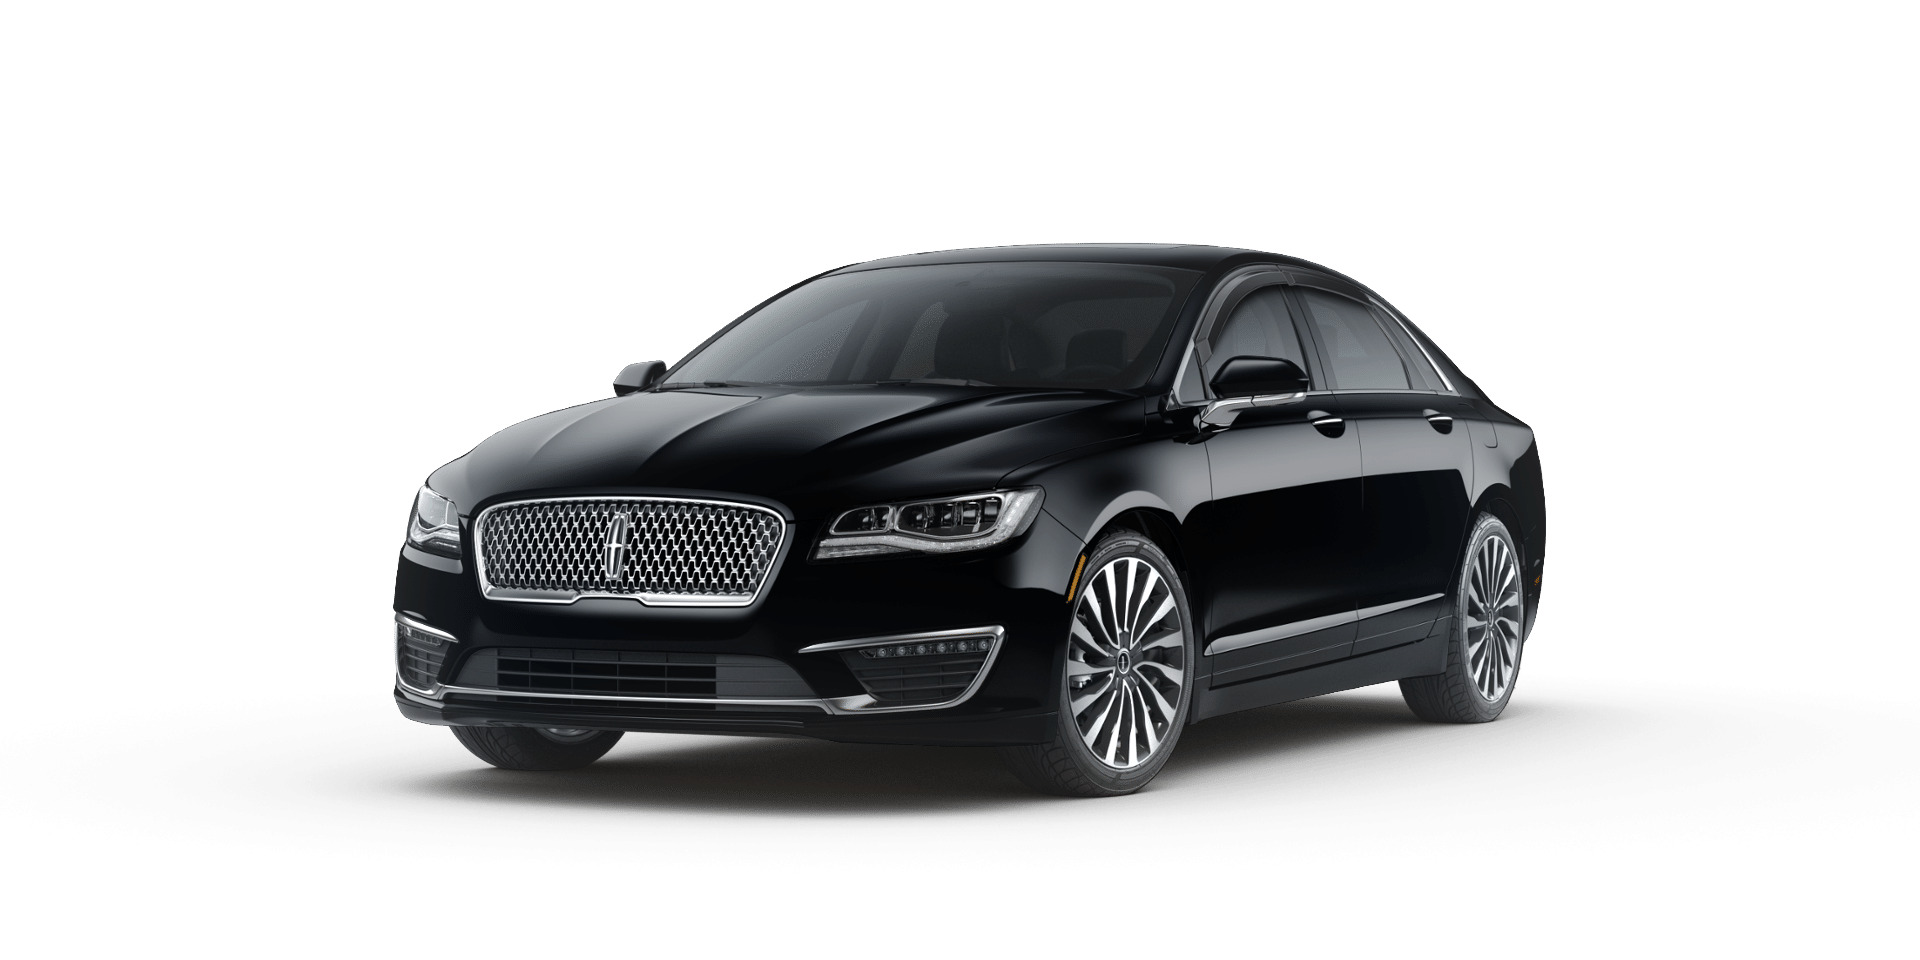 2017 Lincoln MKZ - Build & Price